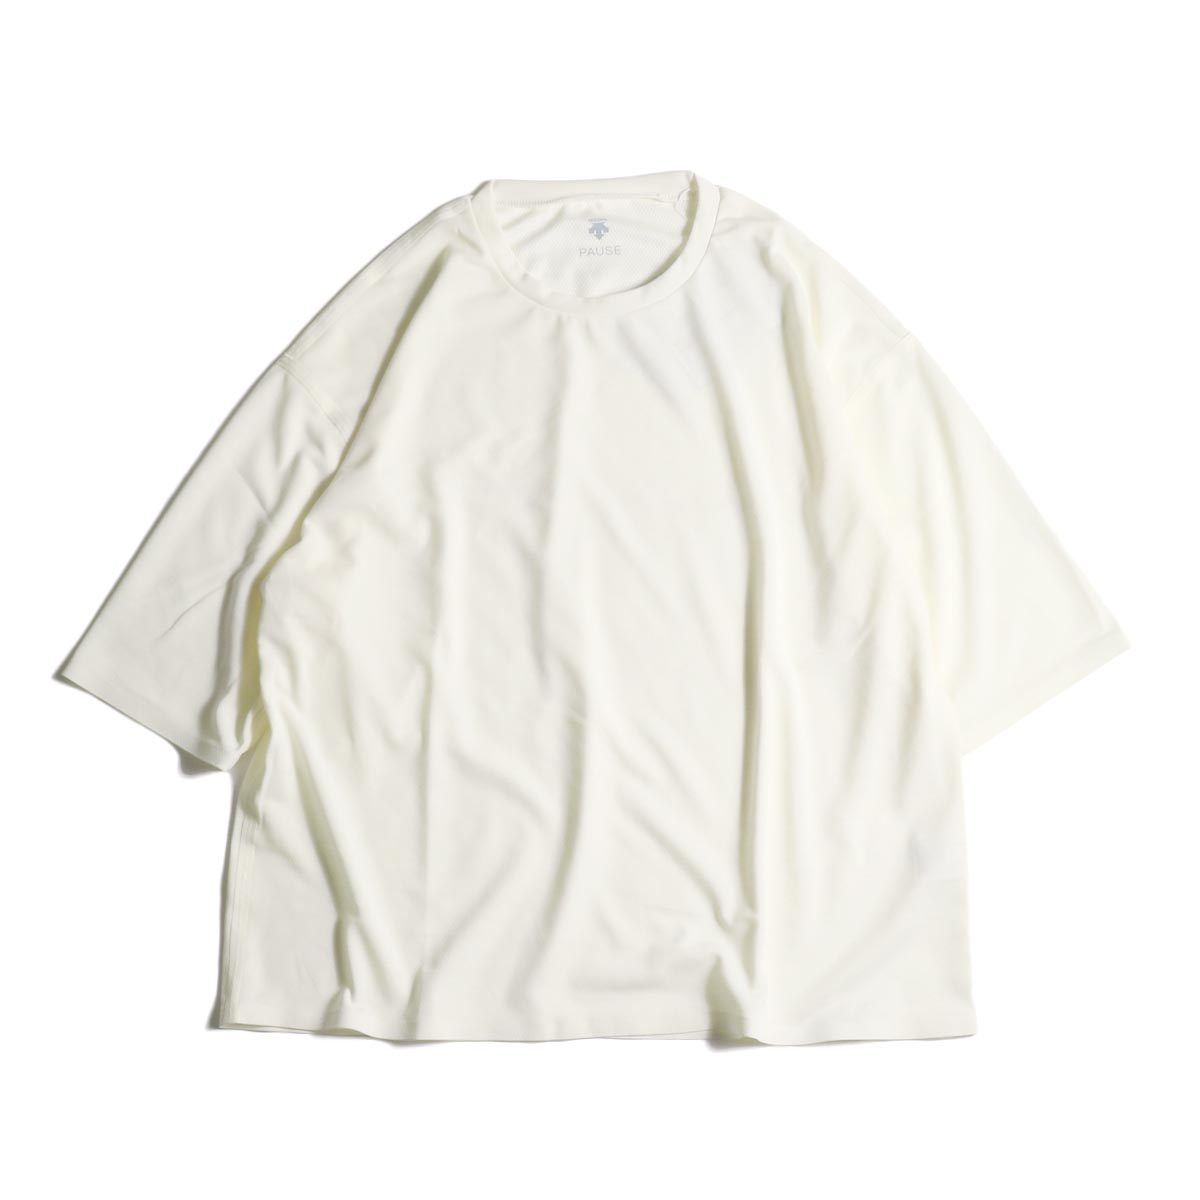 (Ladie's) DESCENTE PAUSE / ZEROSEAM BIG T-SHIRT (White)